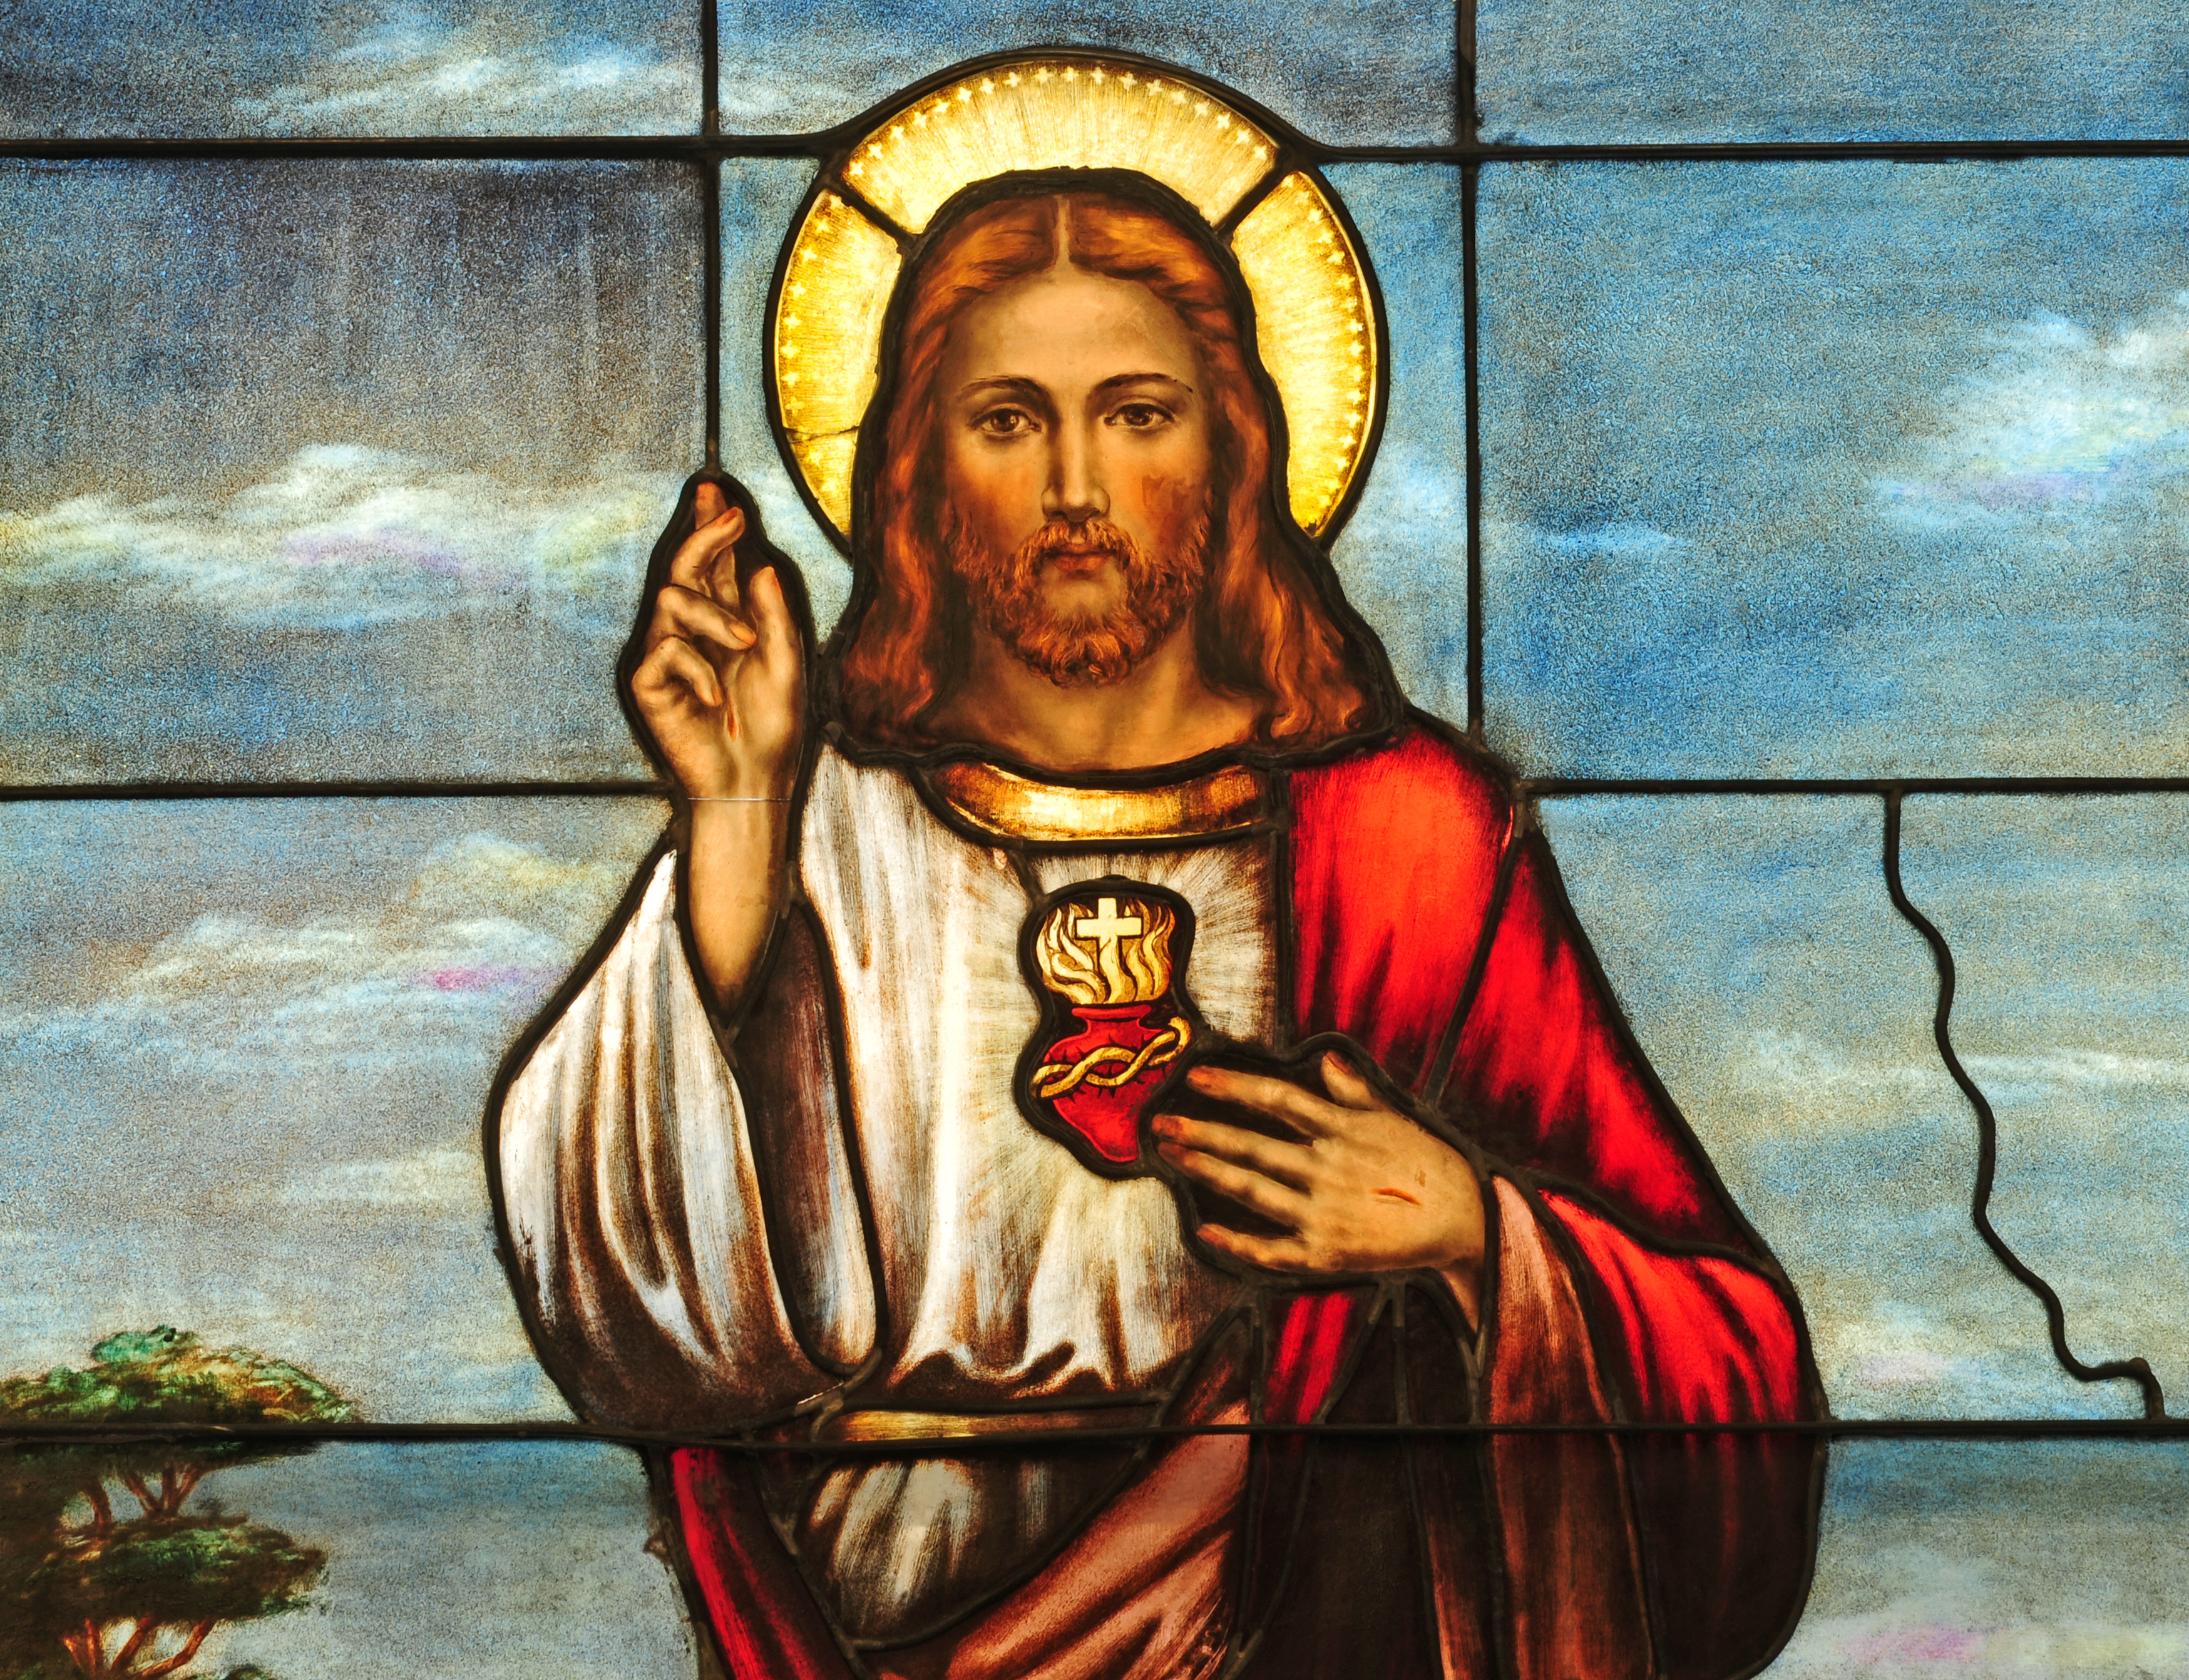 Pictured is Jesus Christ. SHUTTERSTOCK/ Nancy Bauer